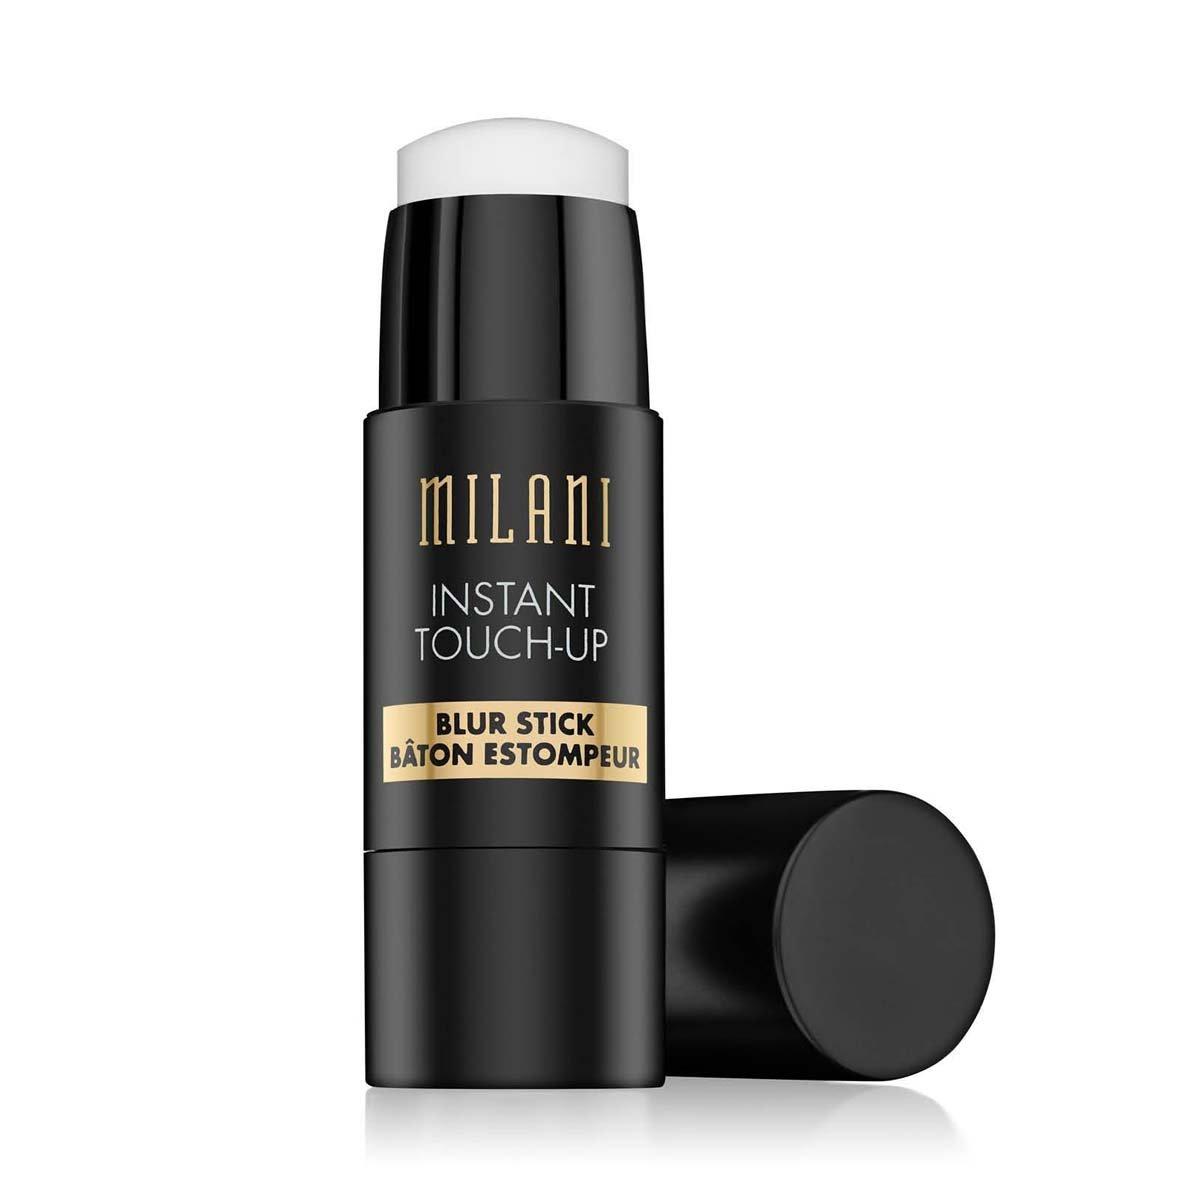 MILANI Instant Touch-Up Blur Stick - Transparent Milani Cosmetics